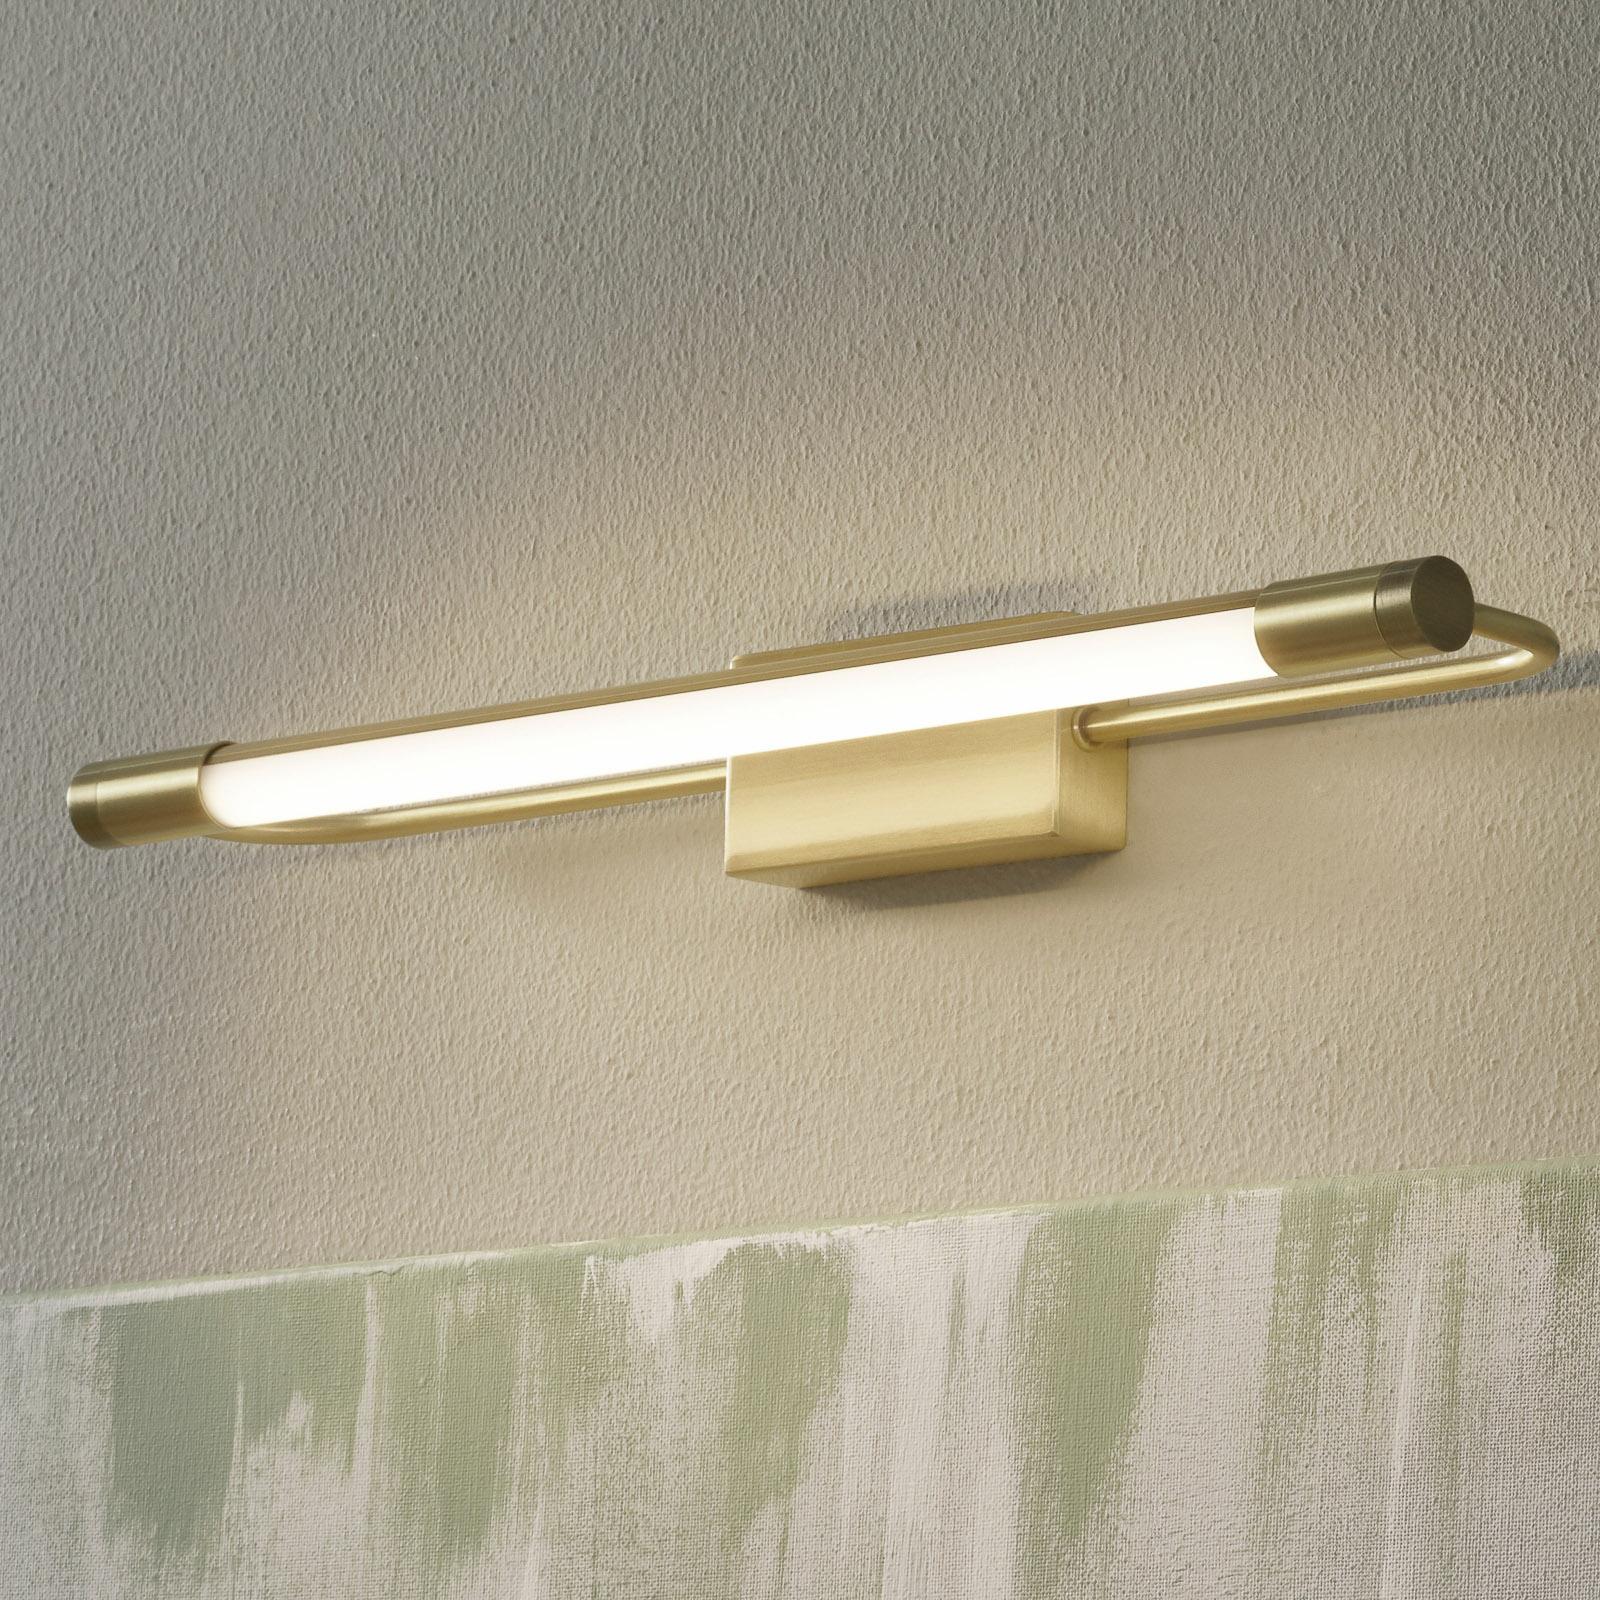 LED-vegglampe Rapallo, messing, IP44, 40 cm